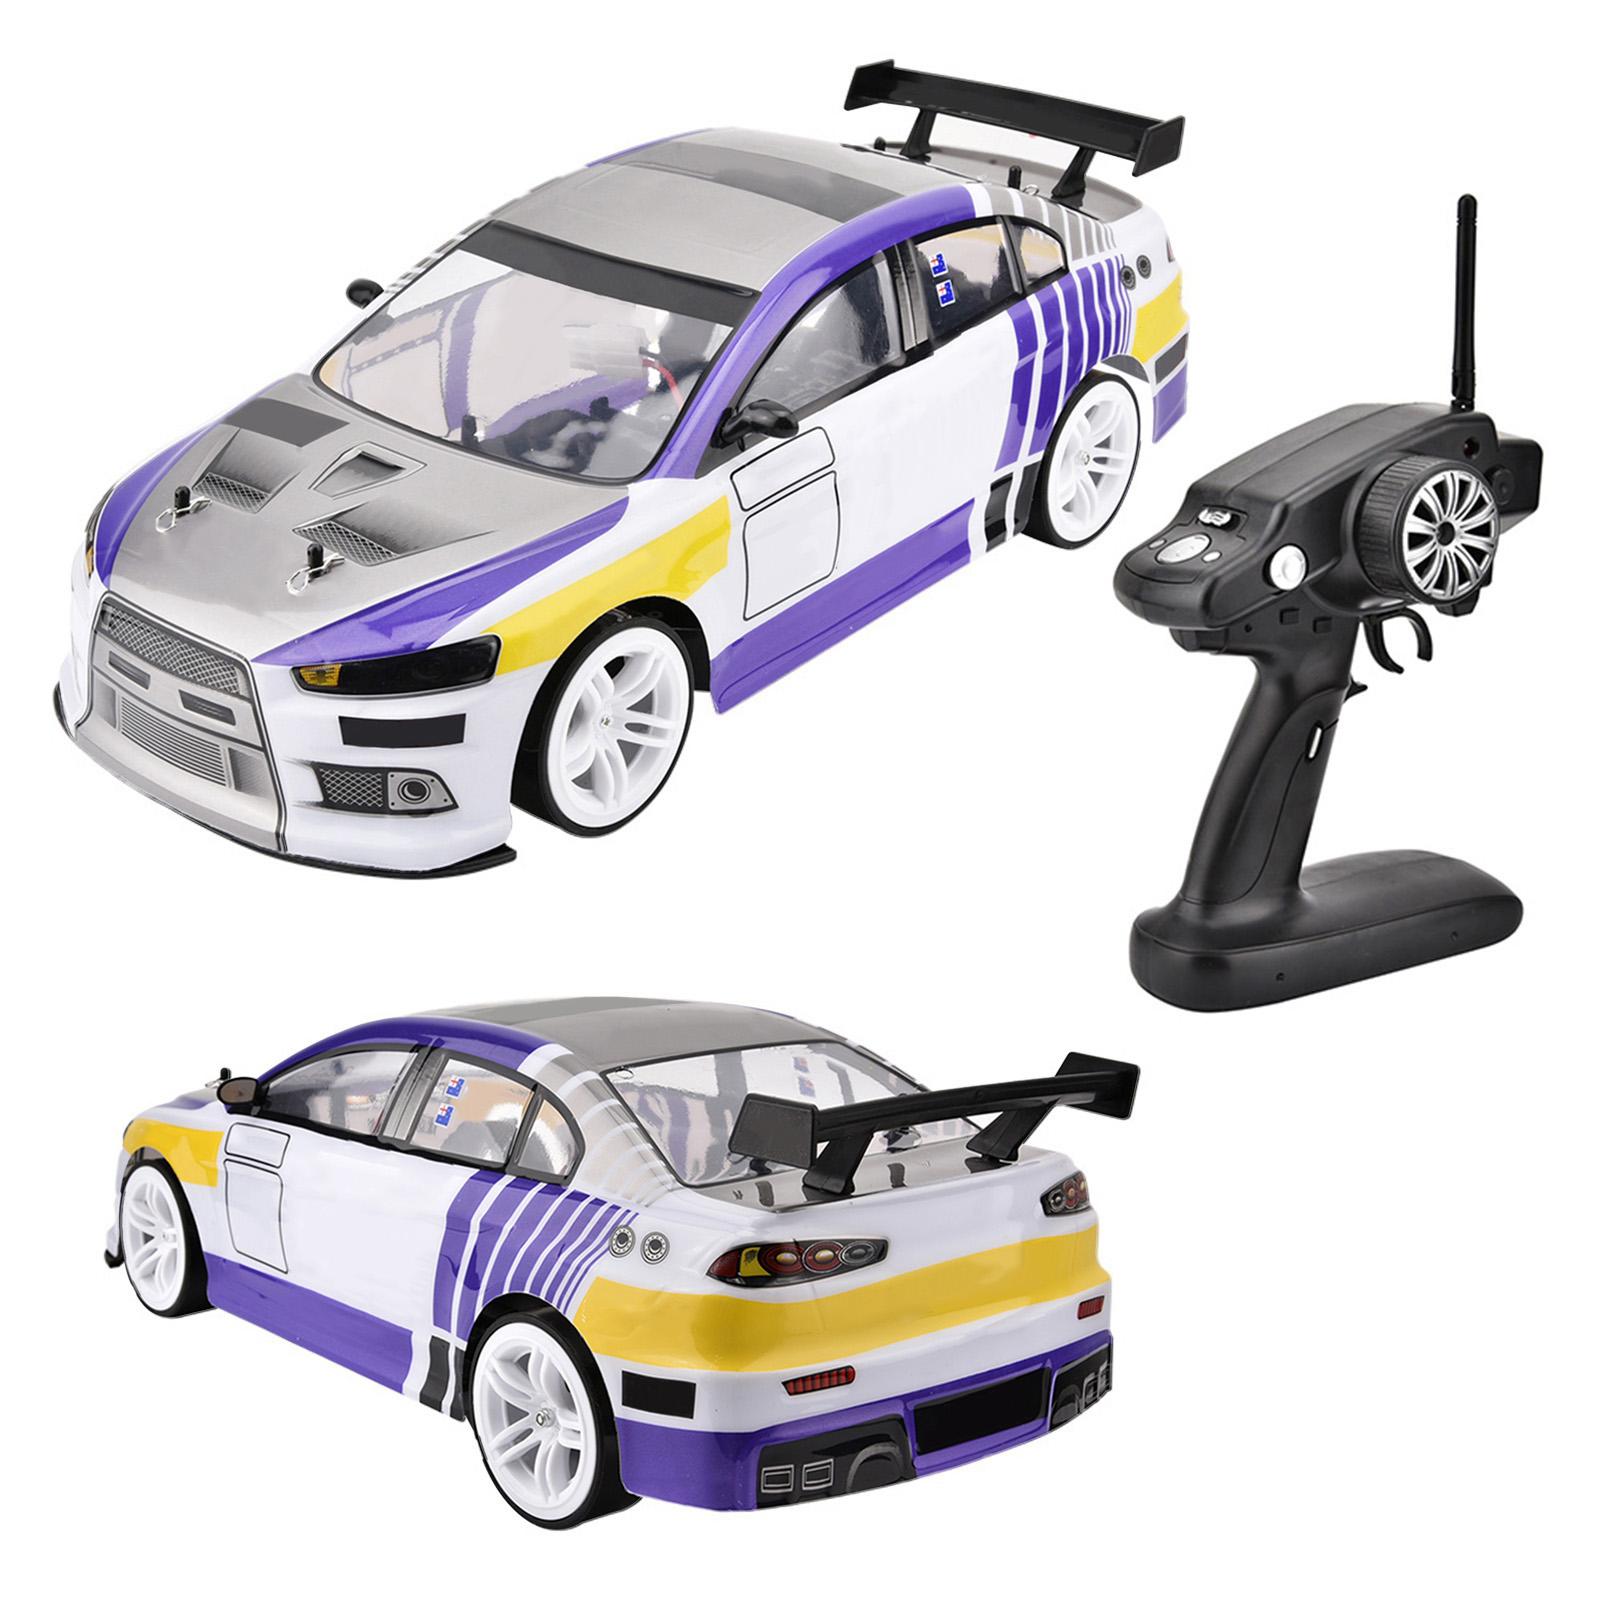 70km/h 1/10 Drive 4WD Remote Control RC Racing Car Drift